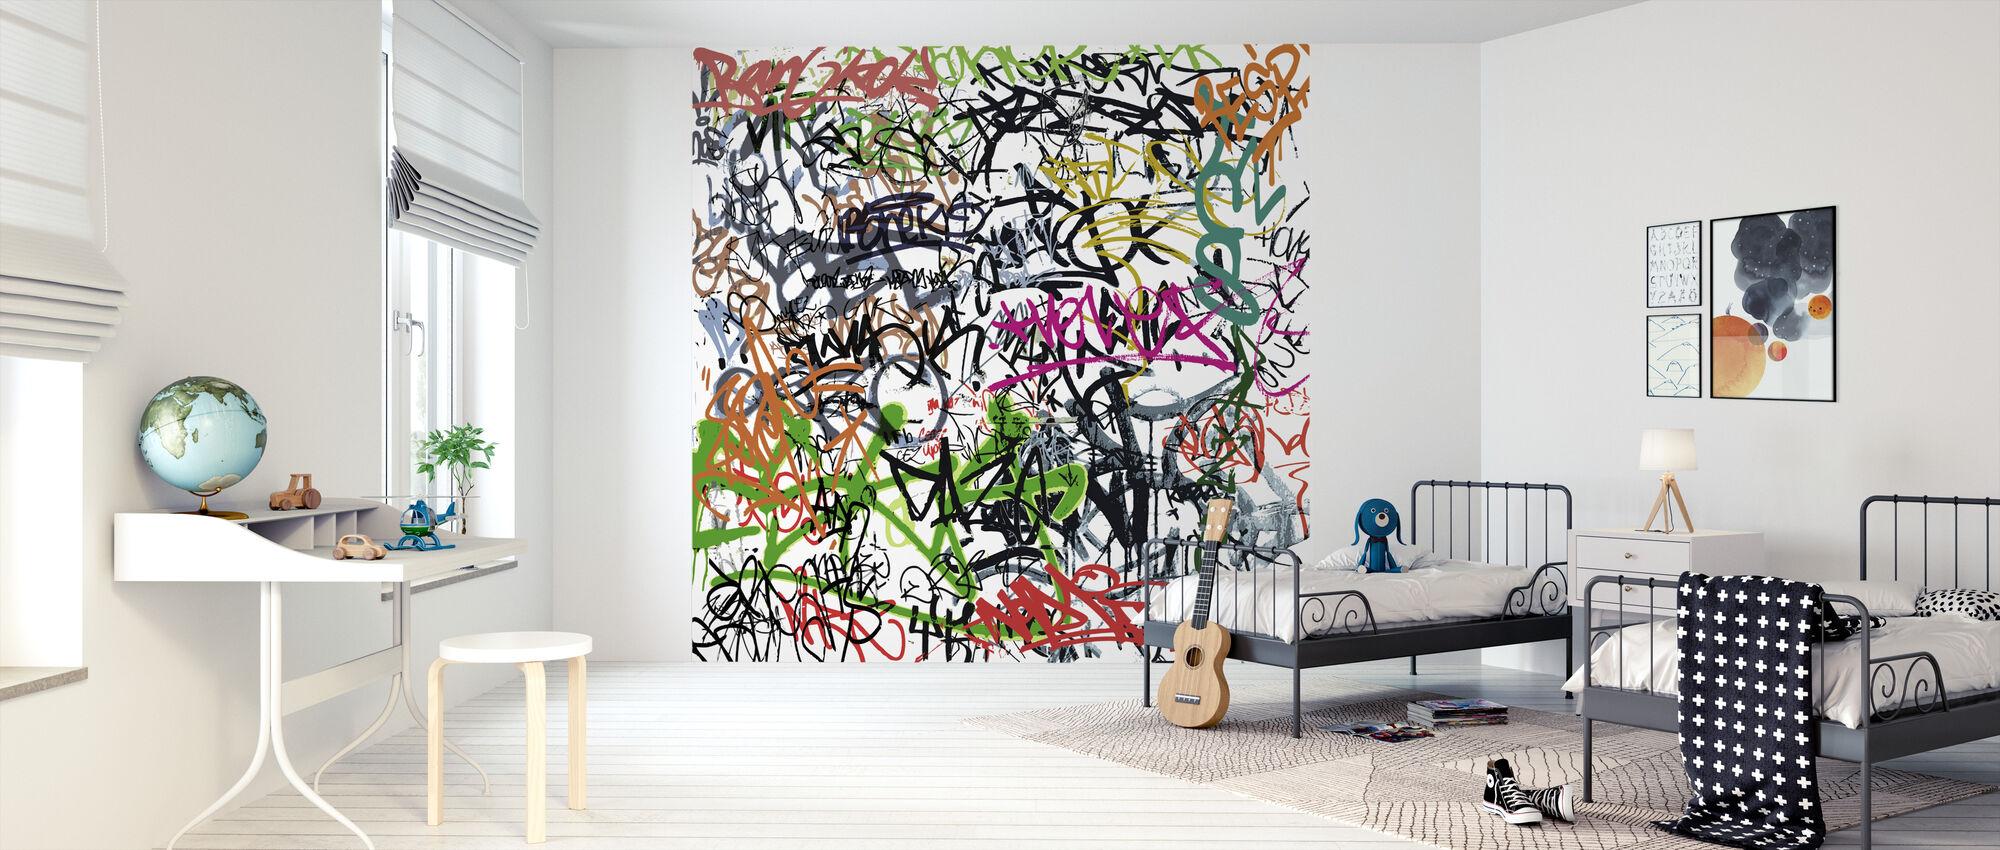 Graffiti-merking - Tapet - Barnerom